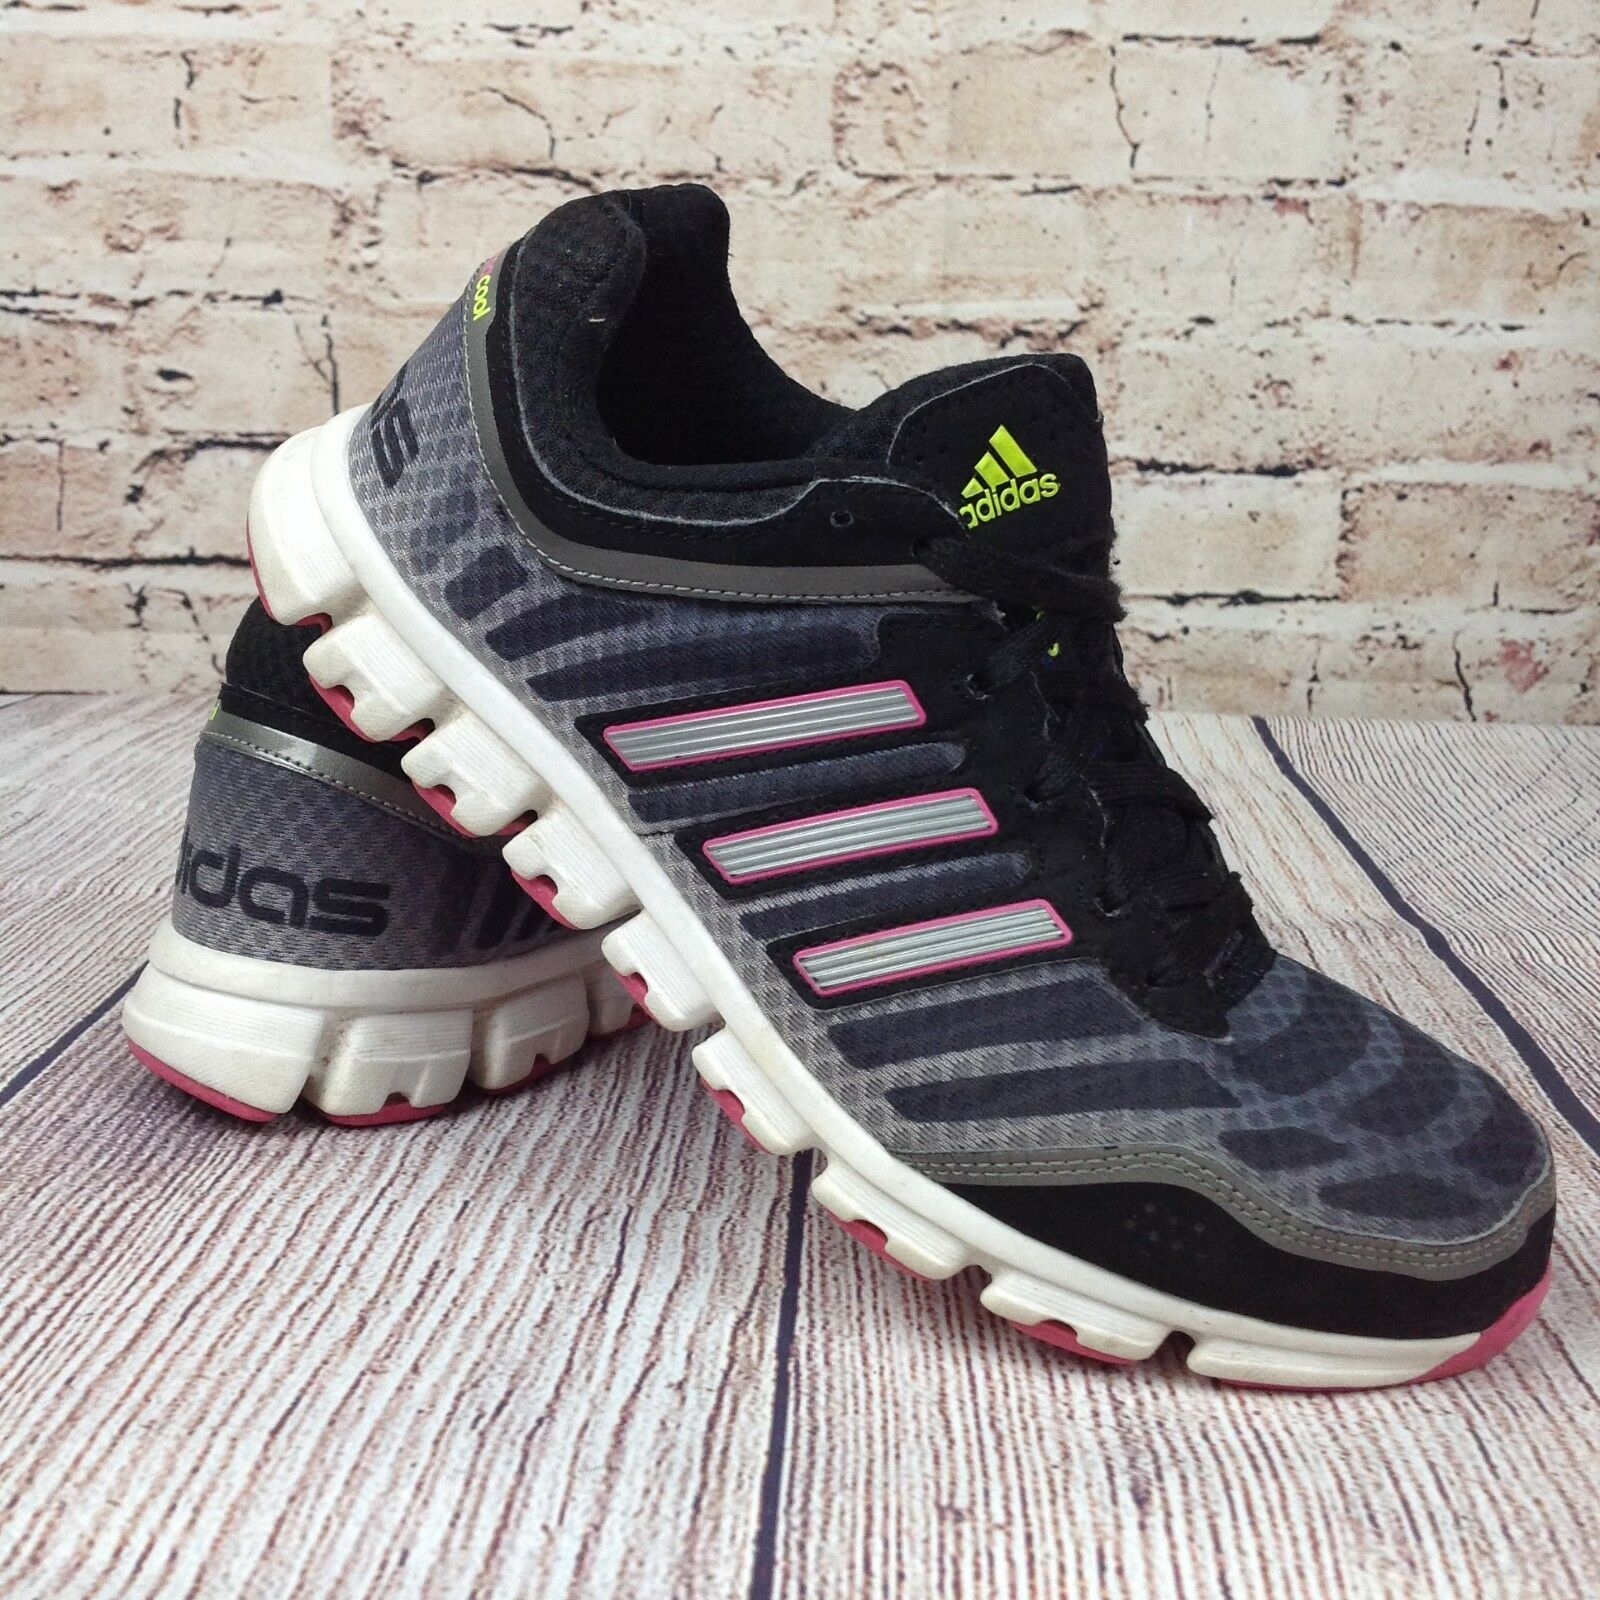 ADIDAS Climacool Aerate 2.0 Damen Sneakers Größe 8.5 Schwarz Pink Metallic-Schuhe